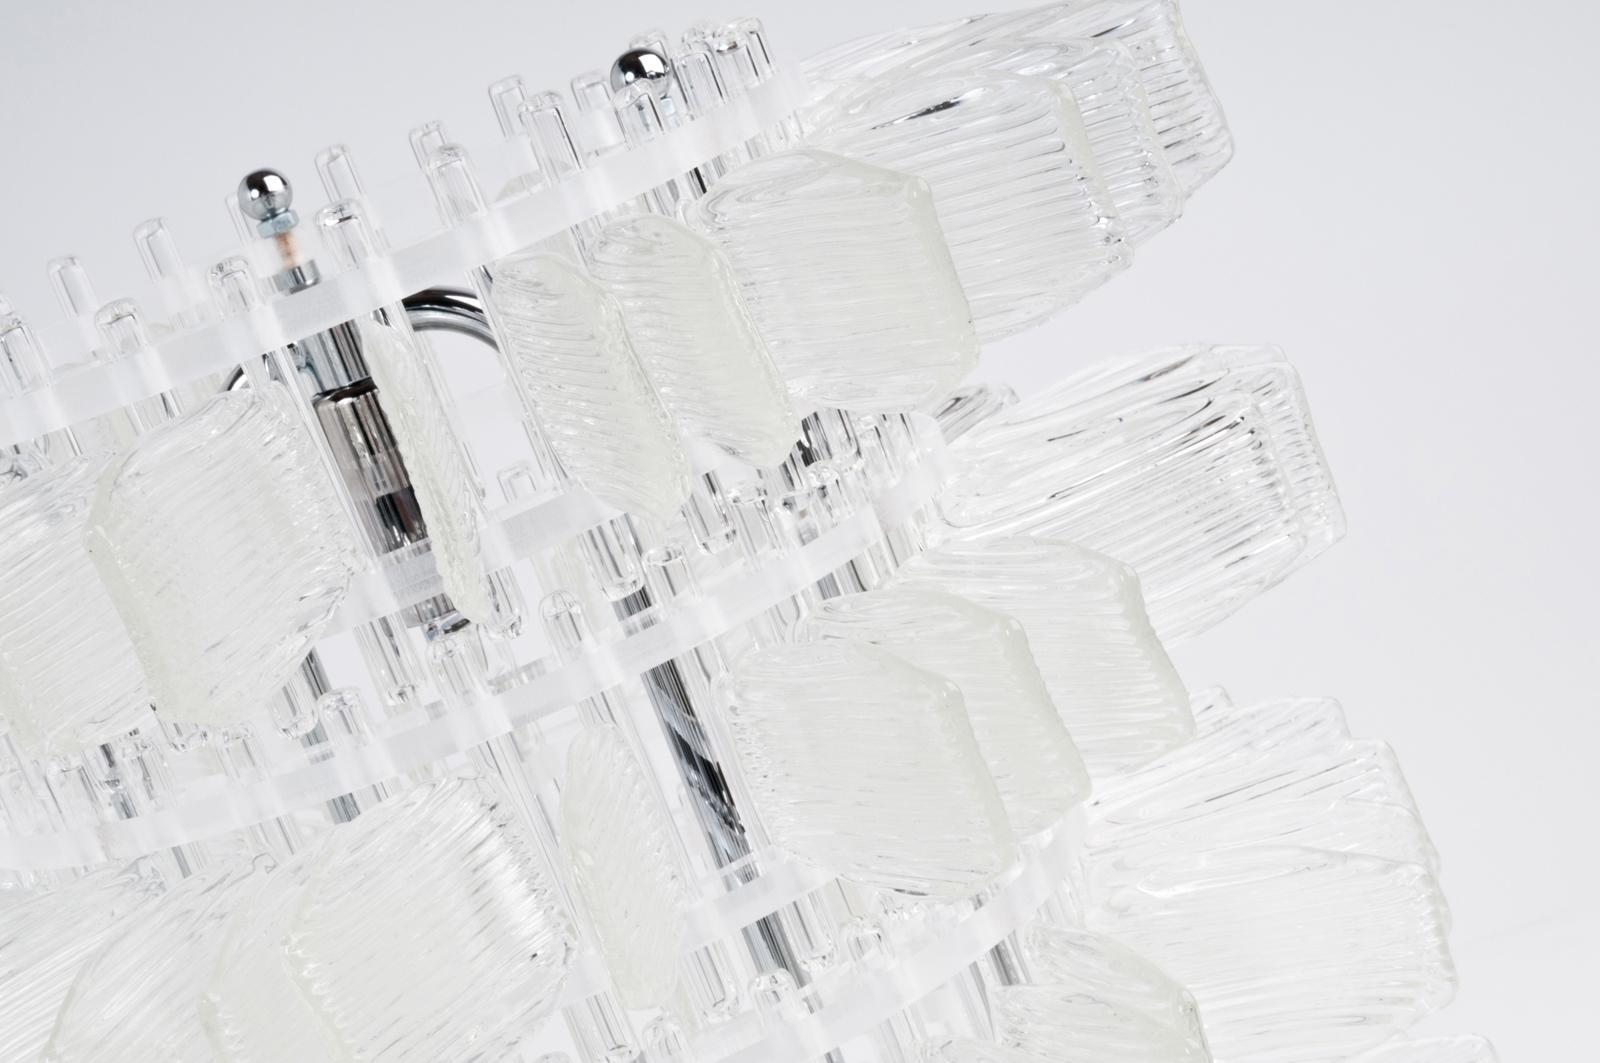 anemone-32-table-chrome-cristal-crystal-veronese-maurizio-galante-tal-lancman-91.jpg